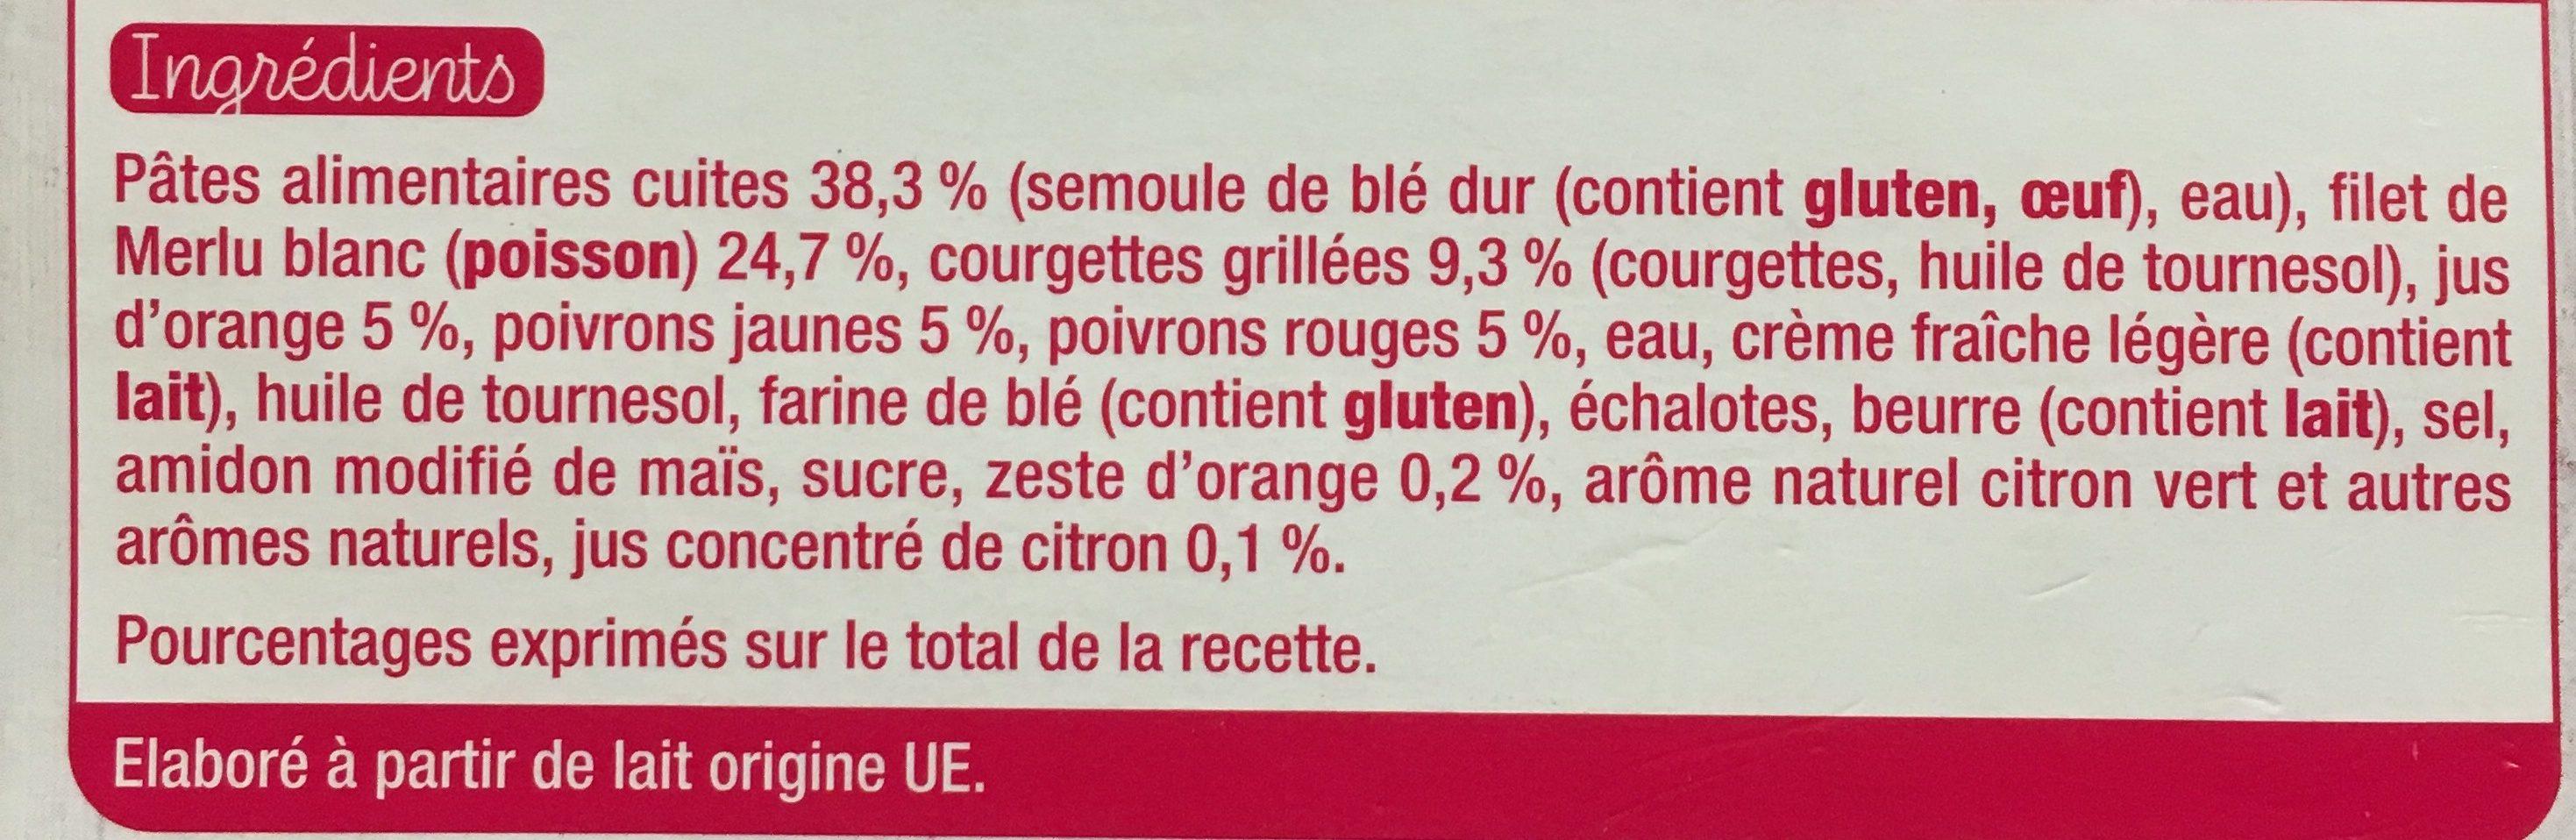 Merlu legumes grilles petites pates - Ingrédients